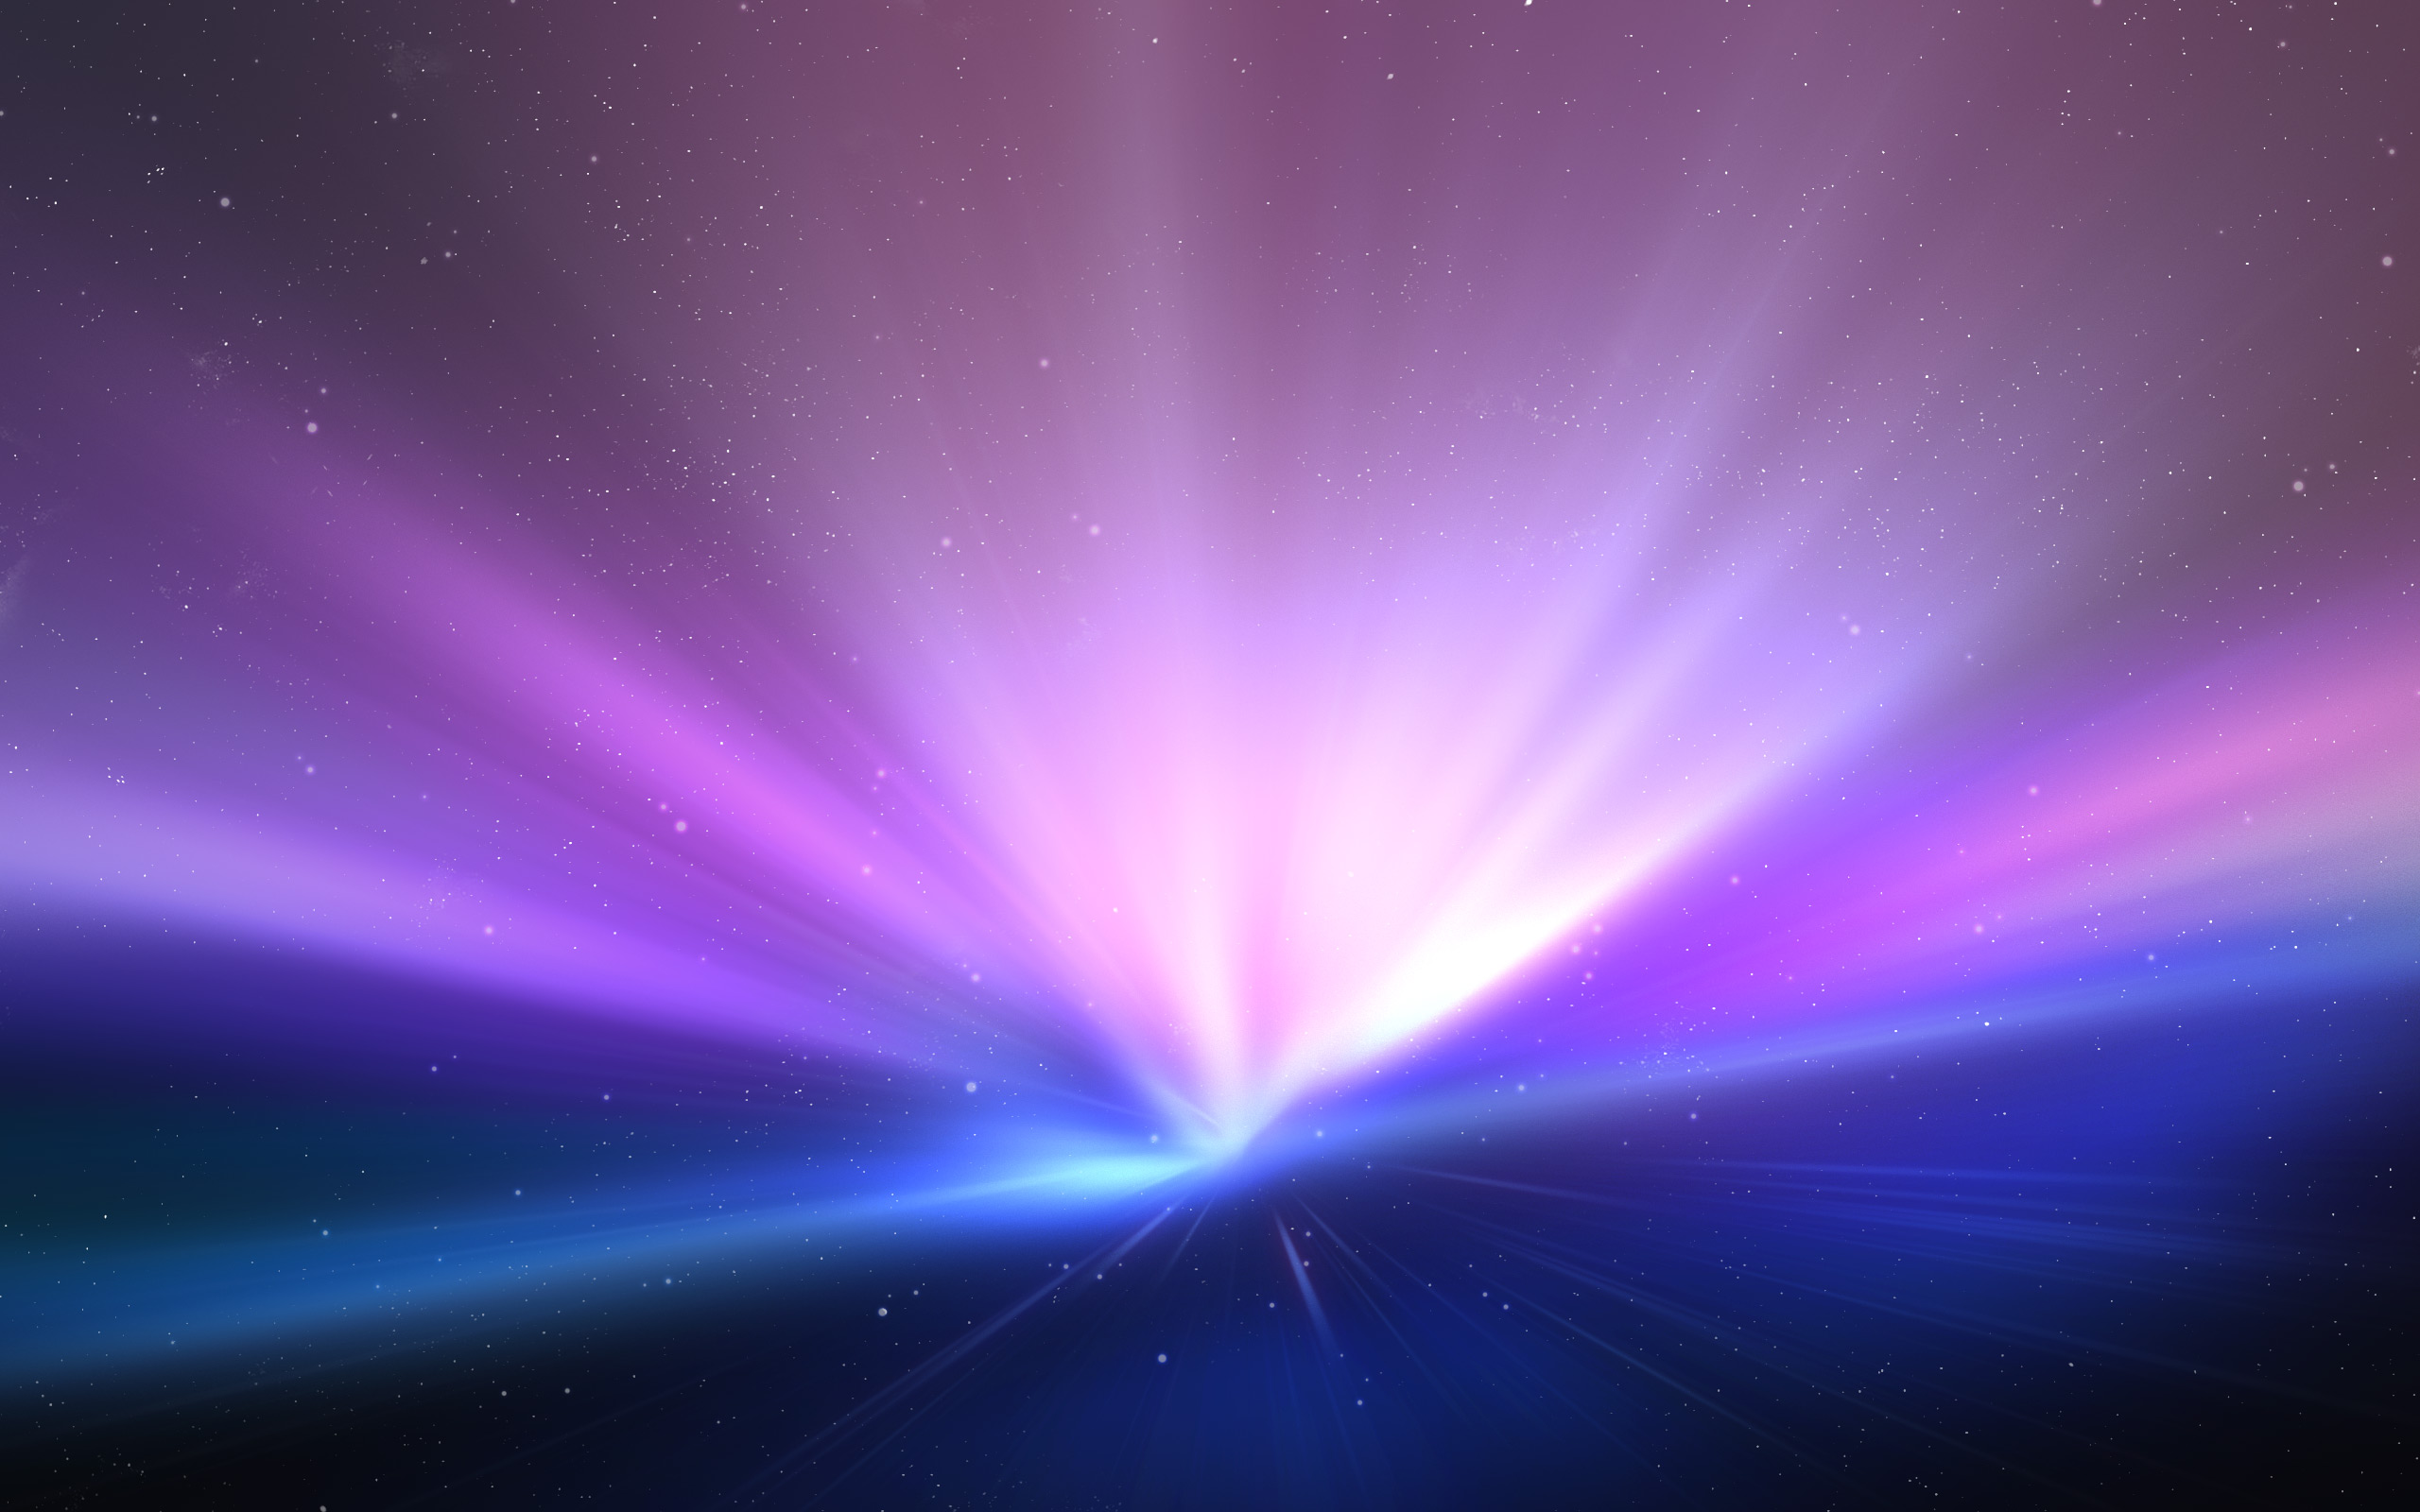 Mac Aurora Wallpaper 2560x1600 Mac Aurora 2560x1600